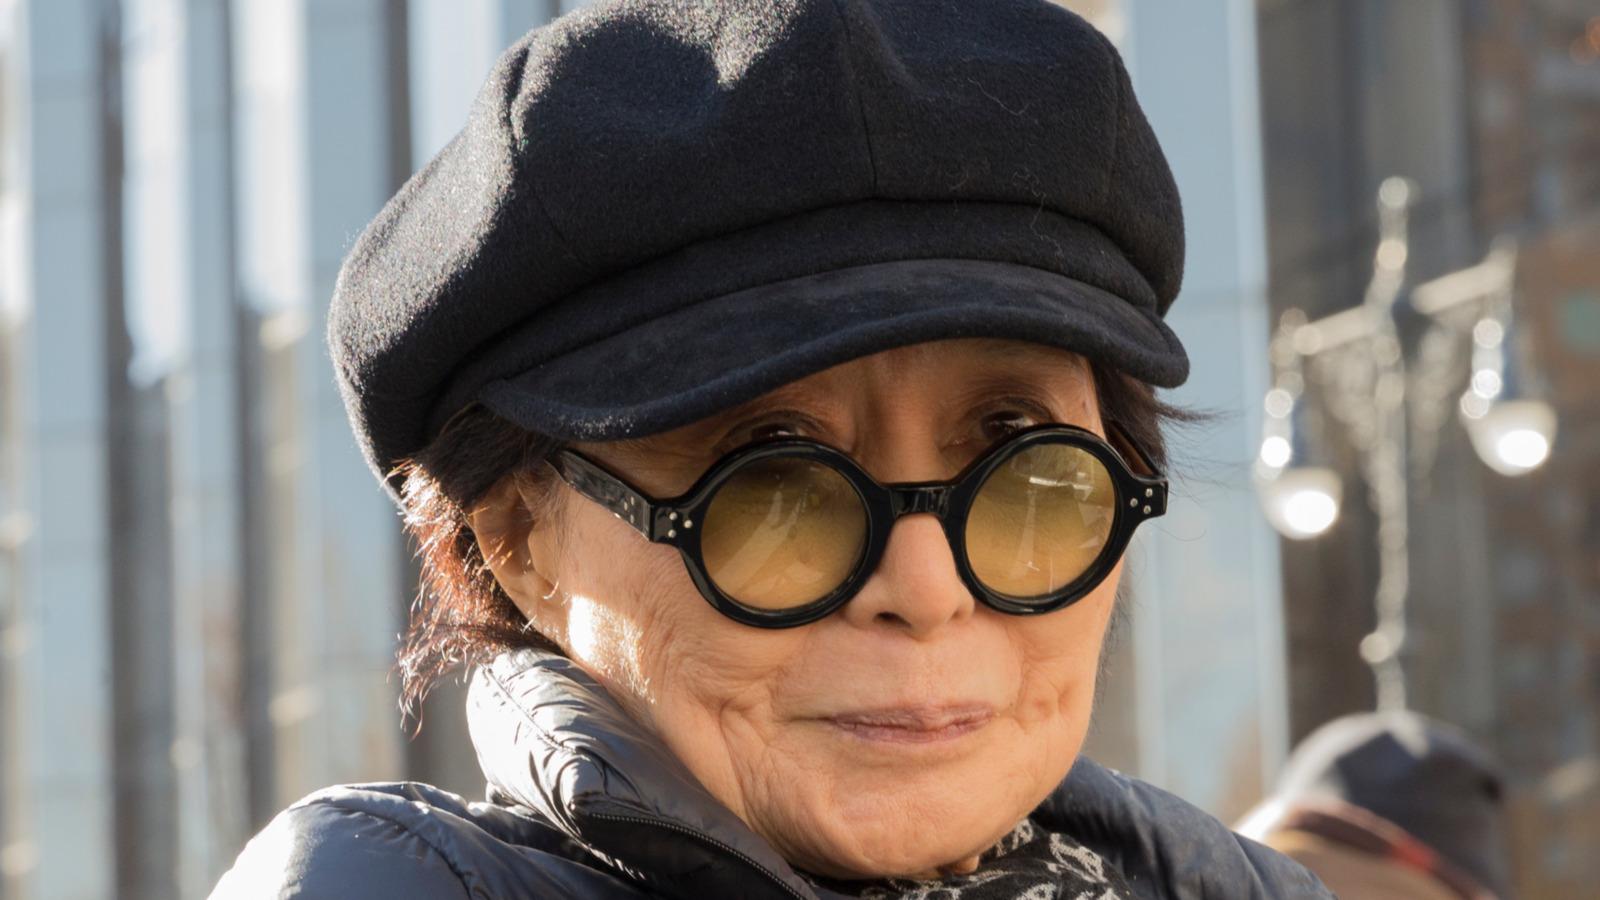 The real Worth of Yoko Ono